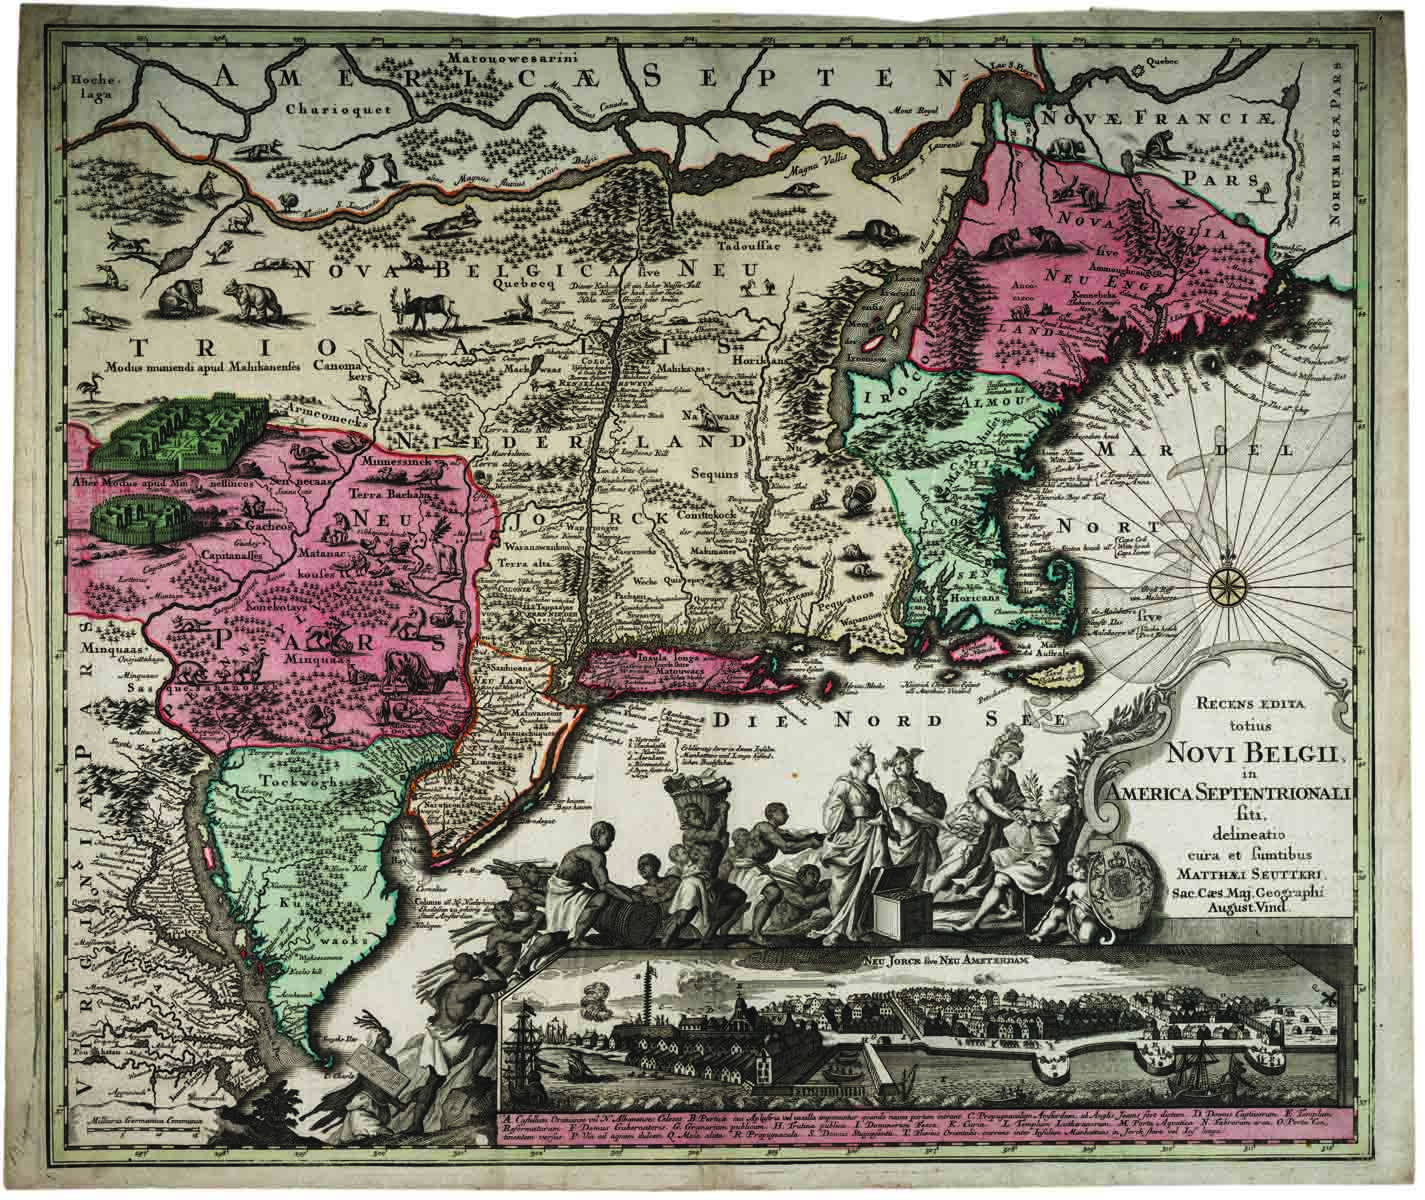 Recens Edita totius Novi Belgii [New Netherland - New York], 1730. (Gilder Lehrm